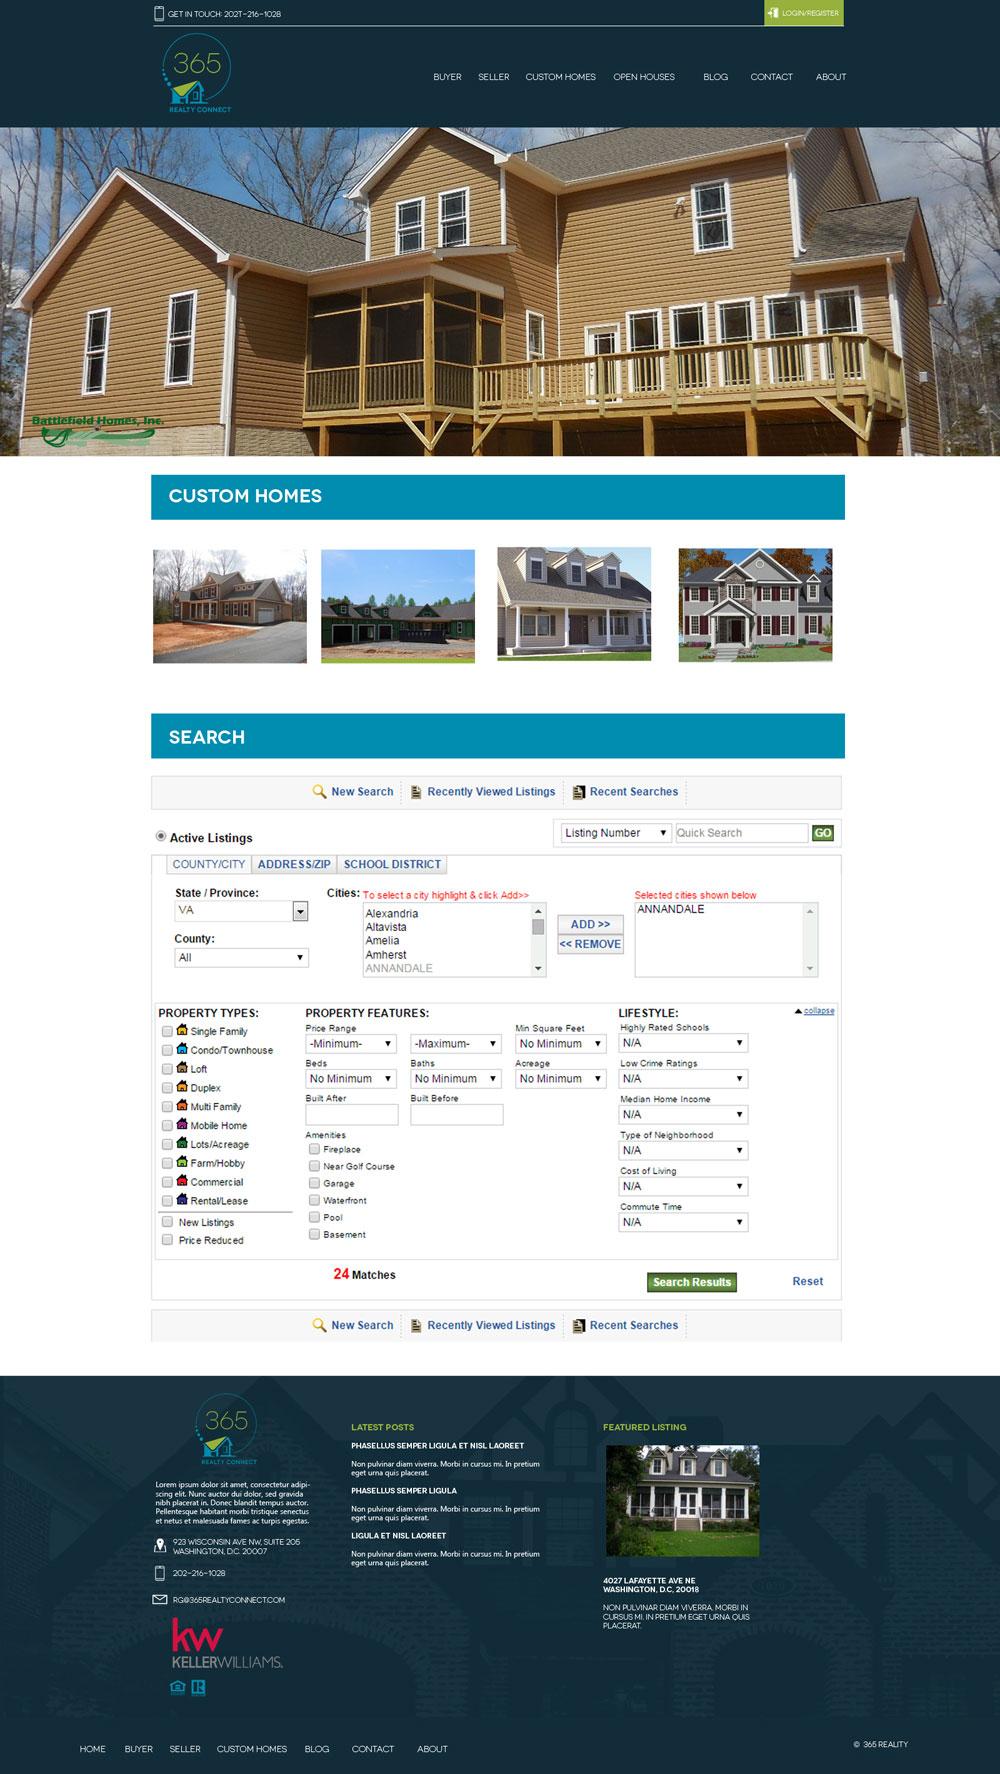 Real Estate Company Website Mock - Home